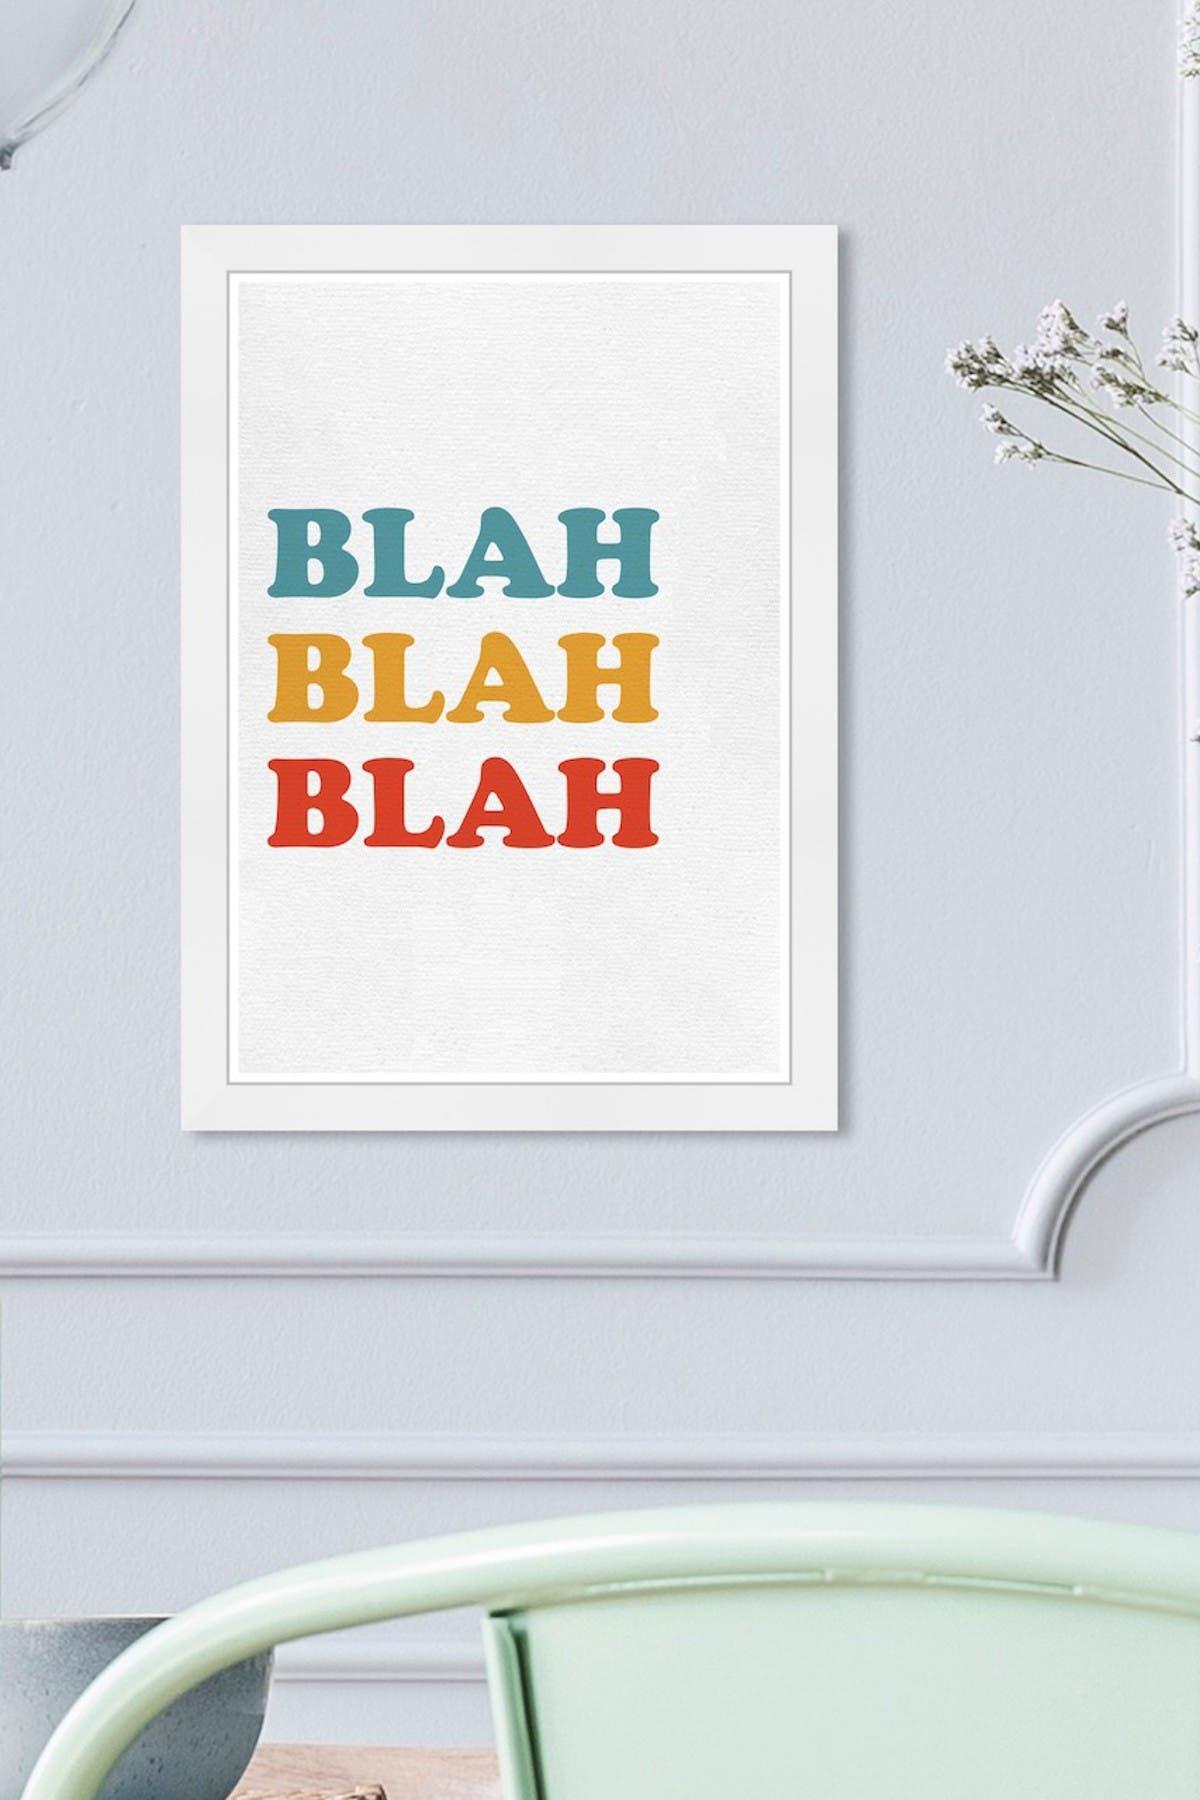 Image of Wynwood Studio Blah Blah Blah White Framed Wall Art